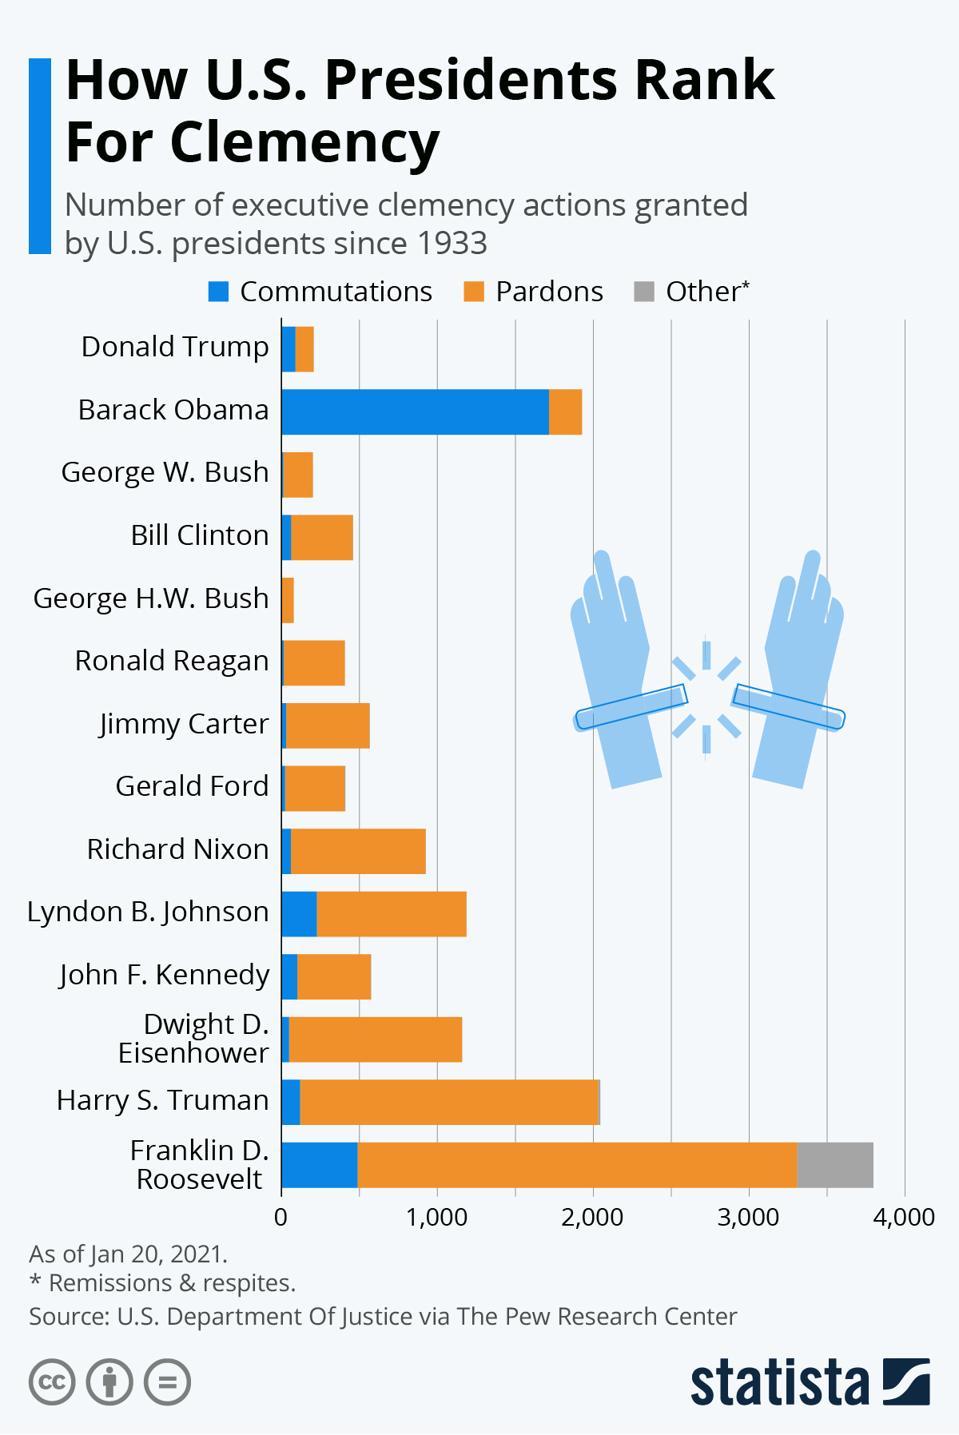 How U.S. Presidents Rank For Clemency